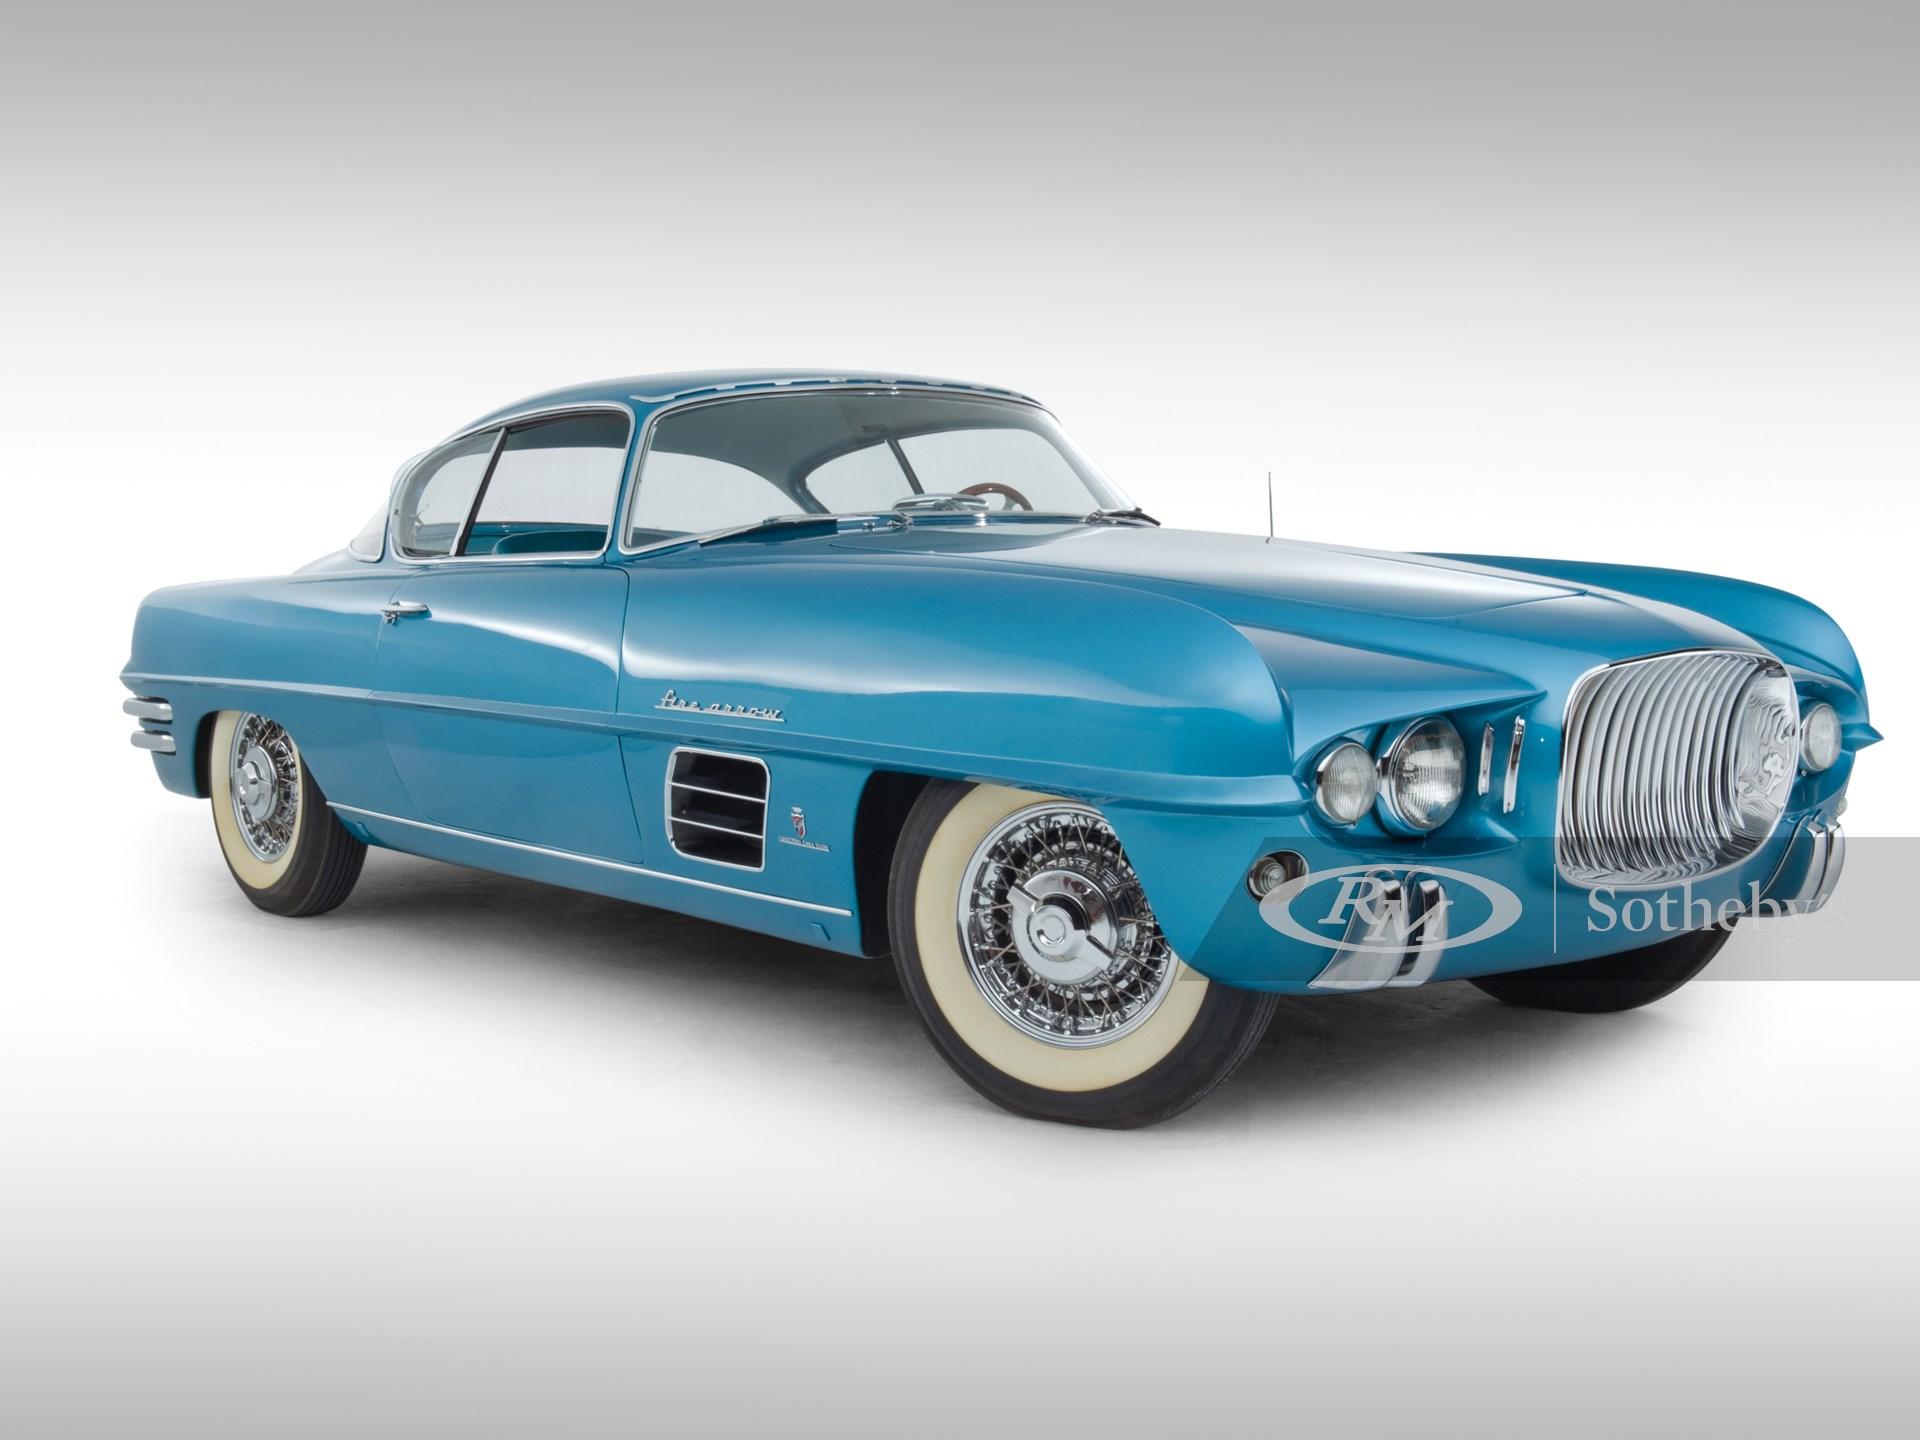 1954 Dodge Firearrow III Concept Car  -